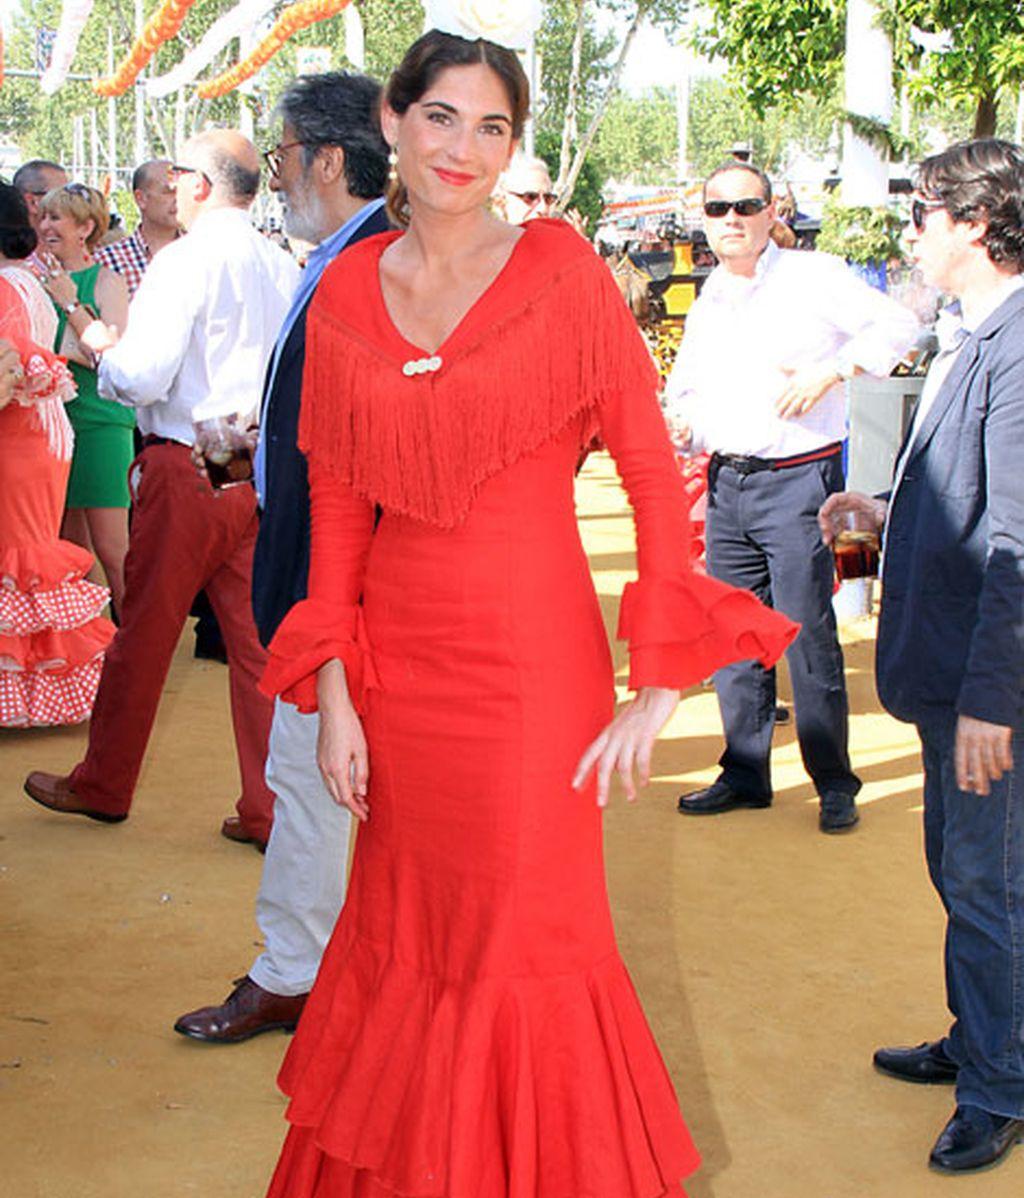 Lourdes Montes, espectacular sin Francisco Rivera